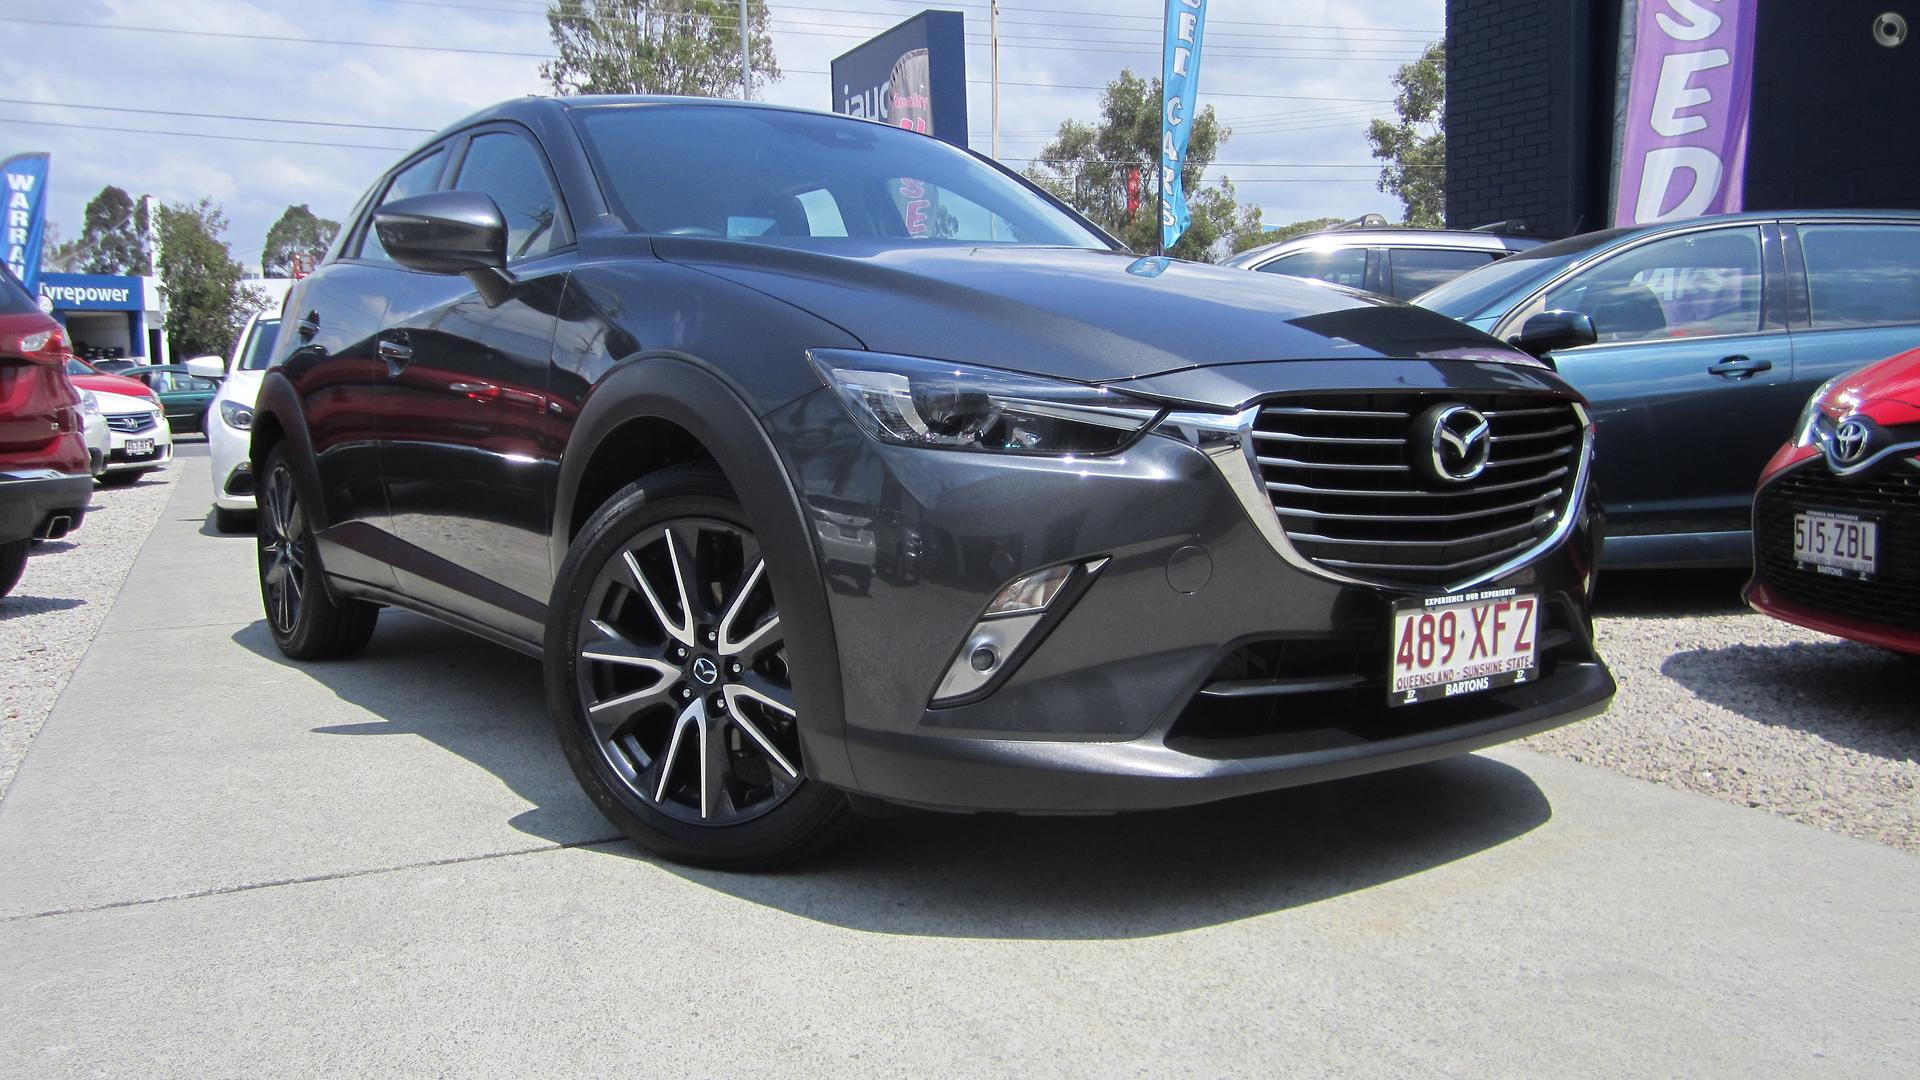 2017 Mazda Cx-3 DK